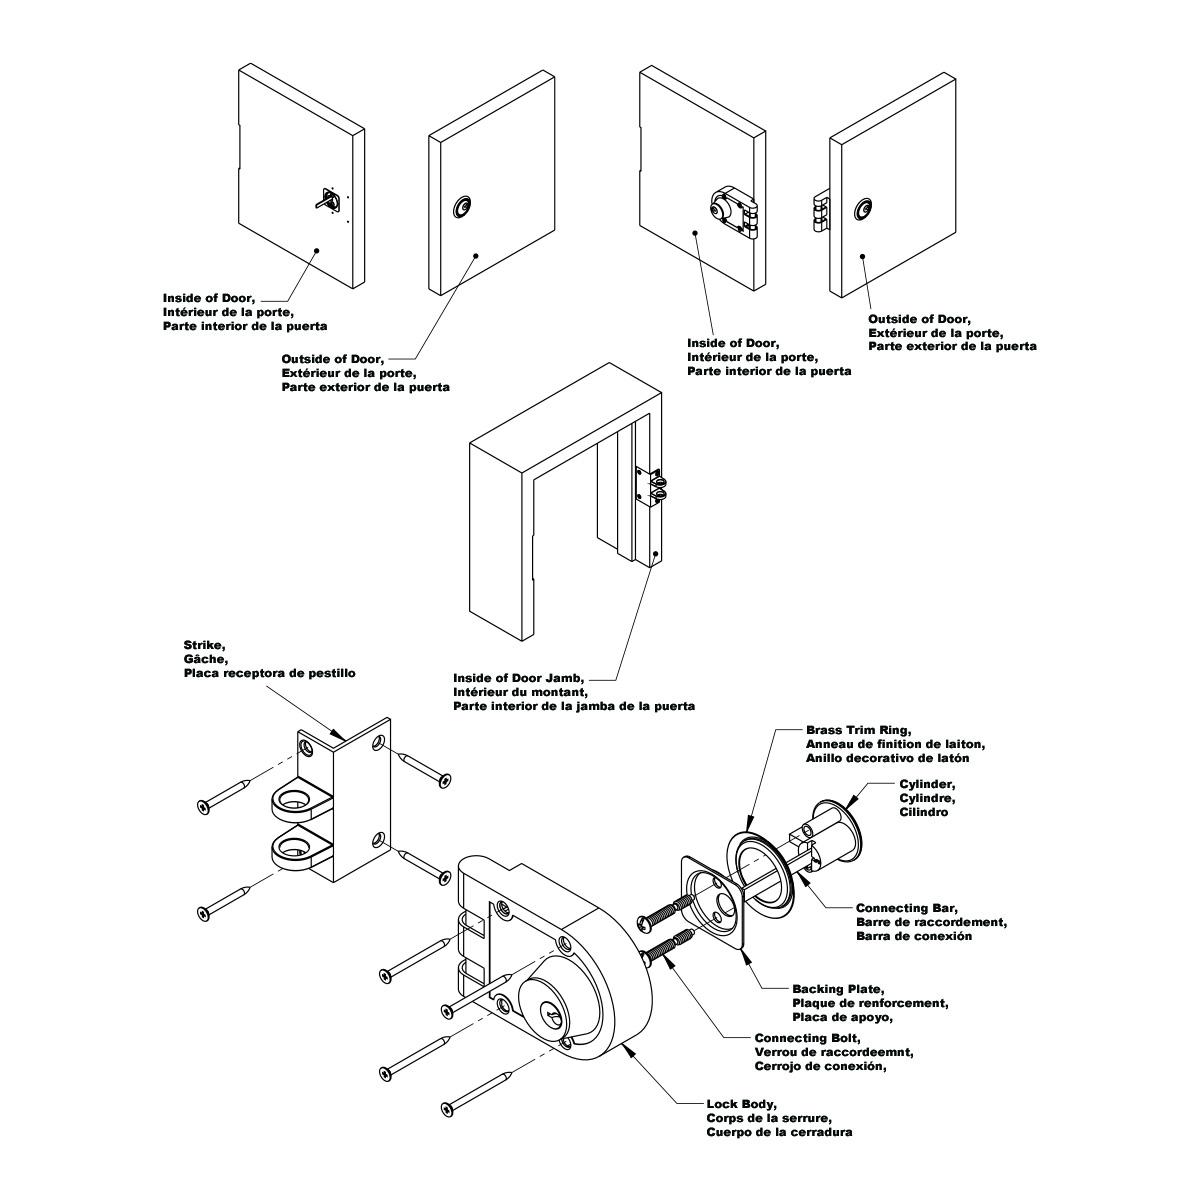 Dead Bolt Diagram - Wiring Diagrams Place